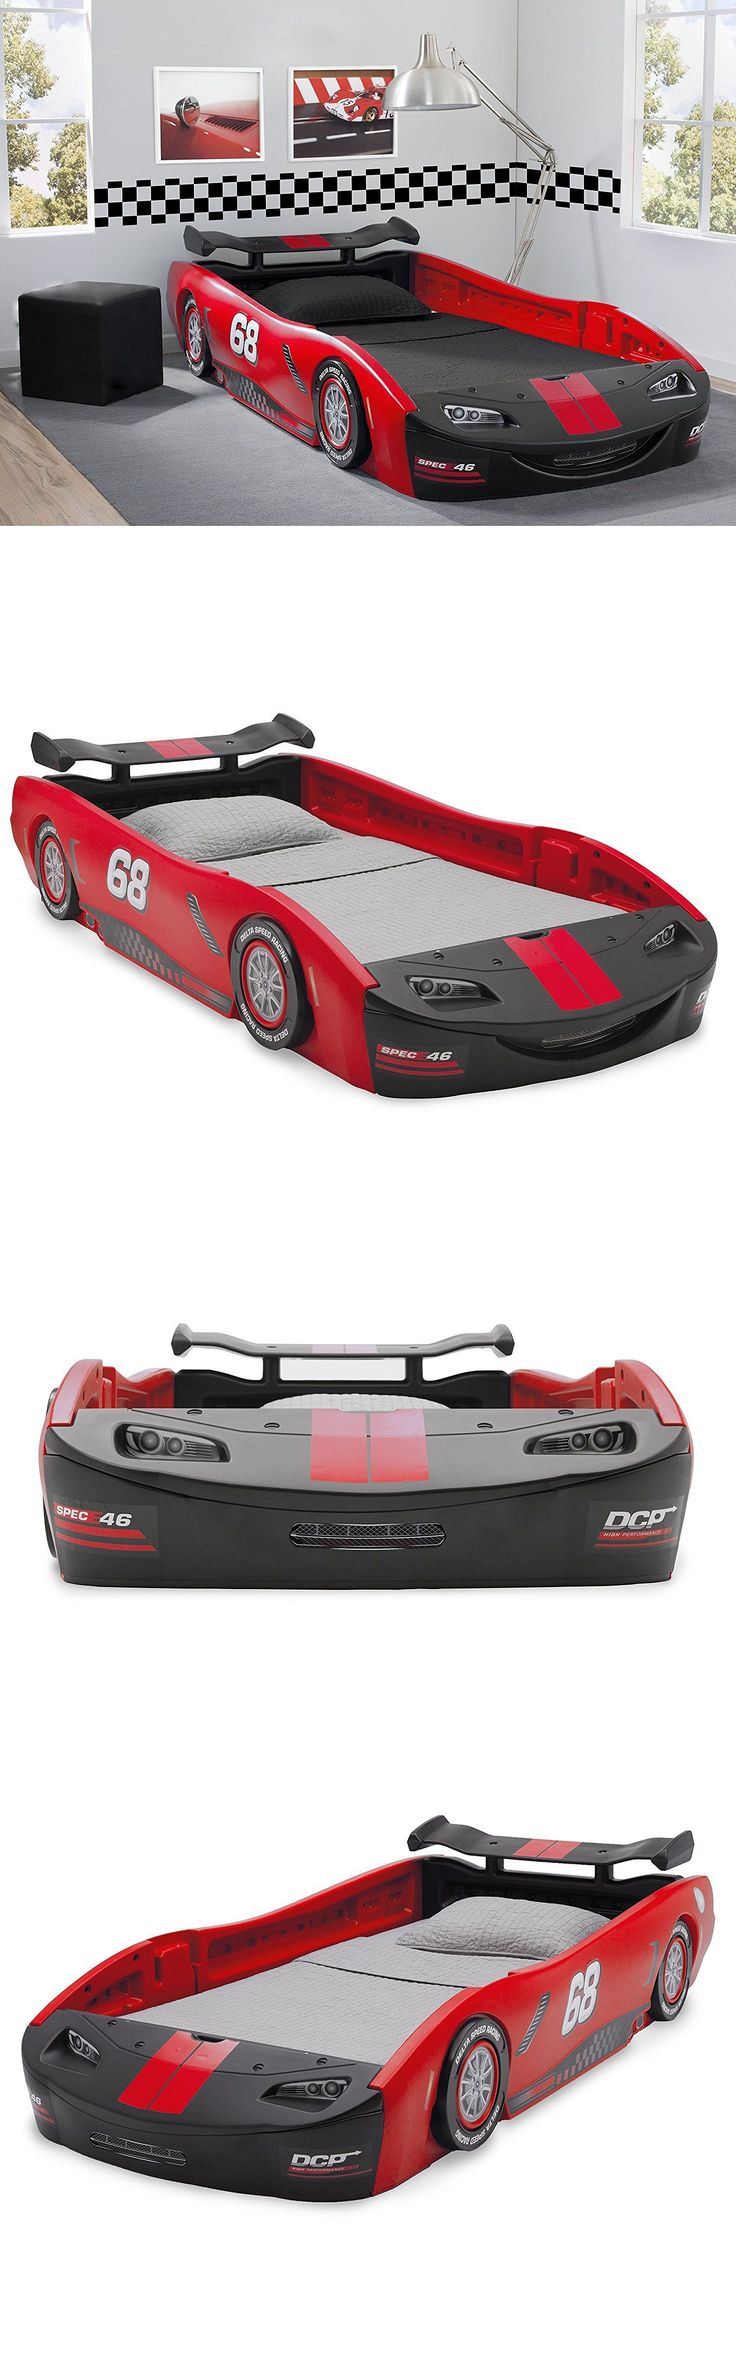 Best Toddler Car Bed Ideas On Pinterest Car Bed Car Beds